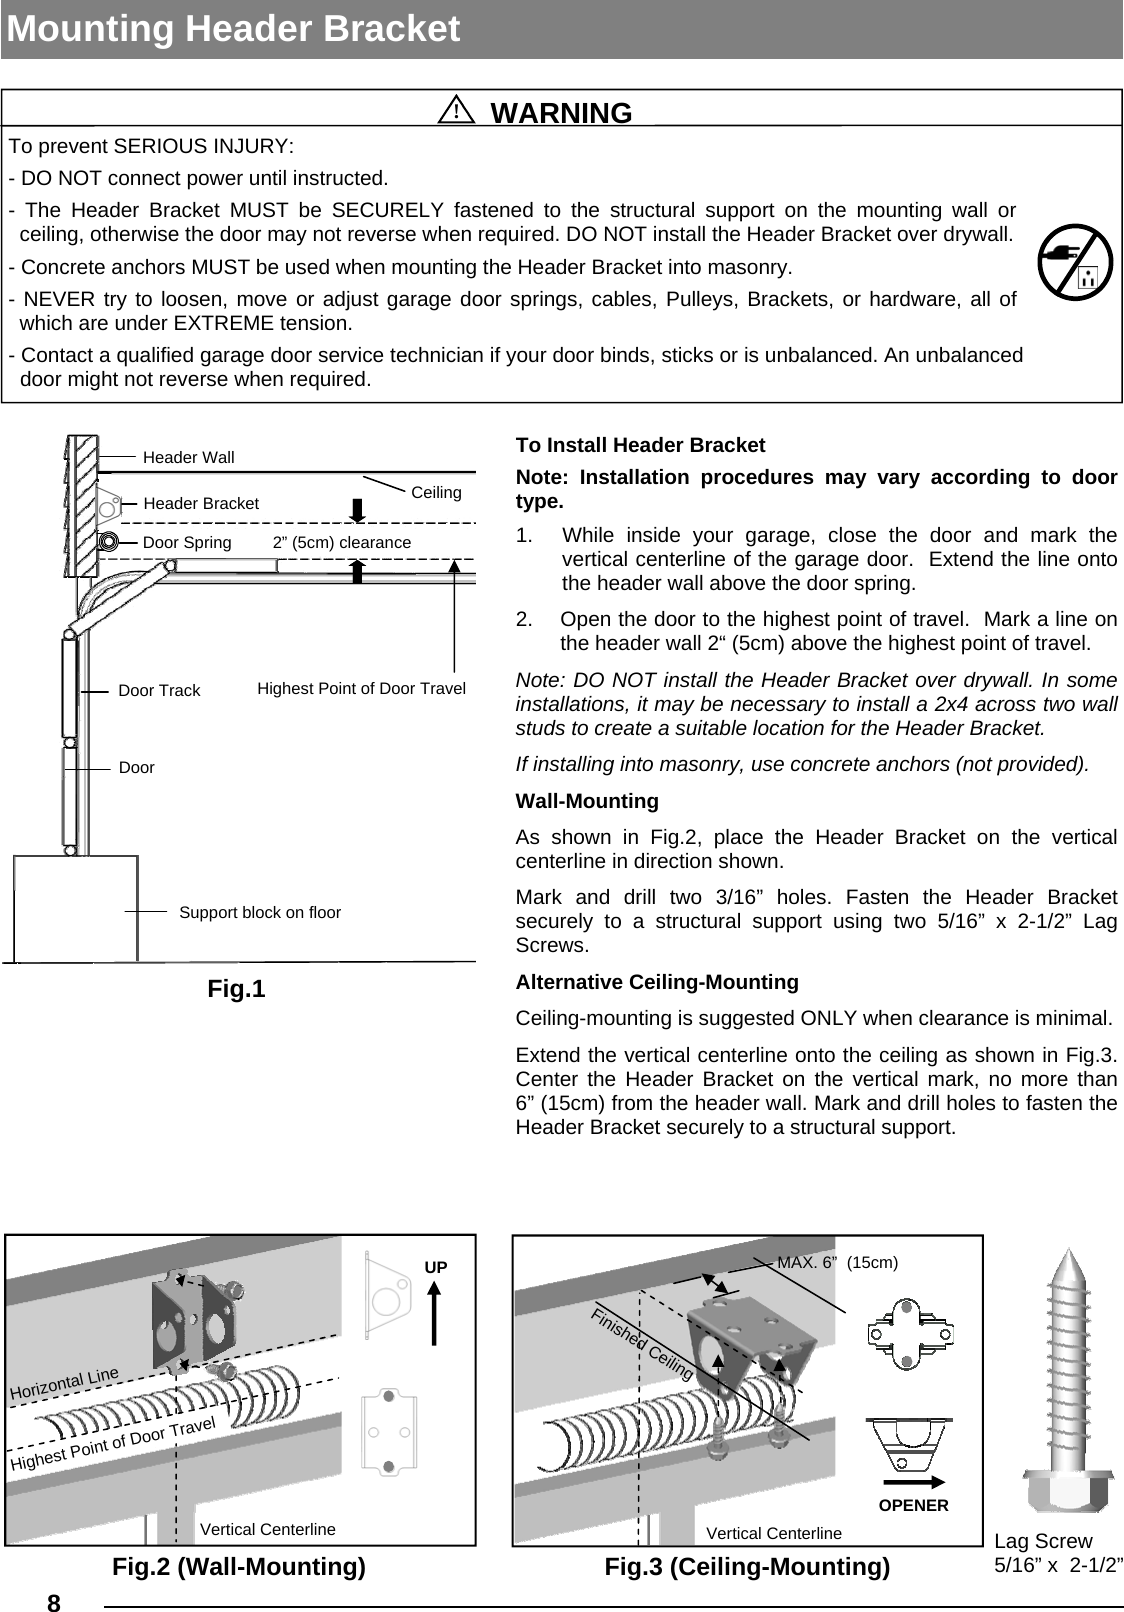 guardian dcrx01 cc garage door opener user manual l5112 t gu 615 150710 rh usermanual wiki Modular Construction Ceilings Metal Ceiling